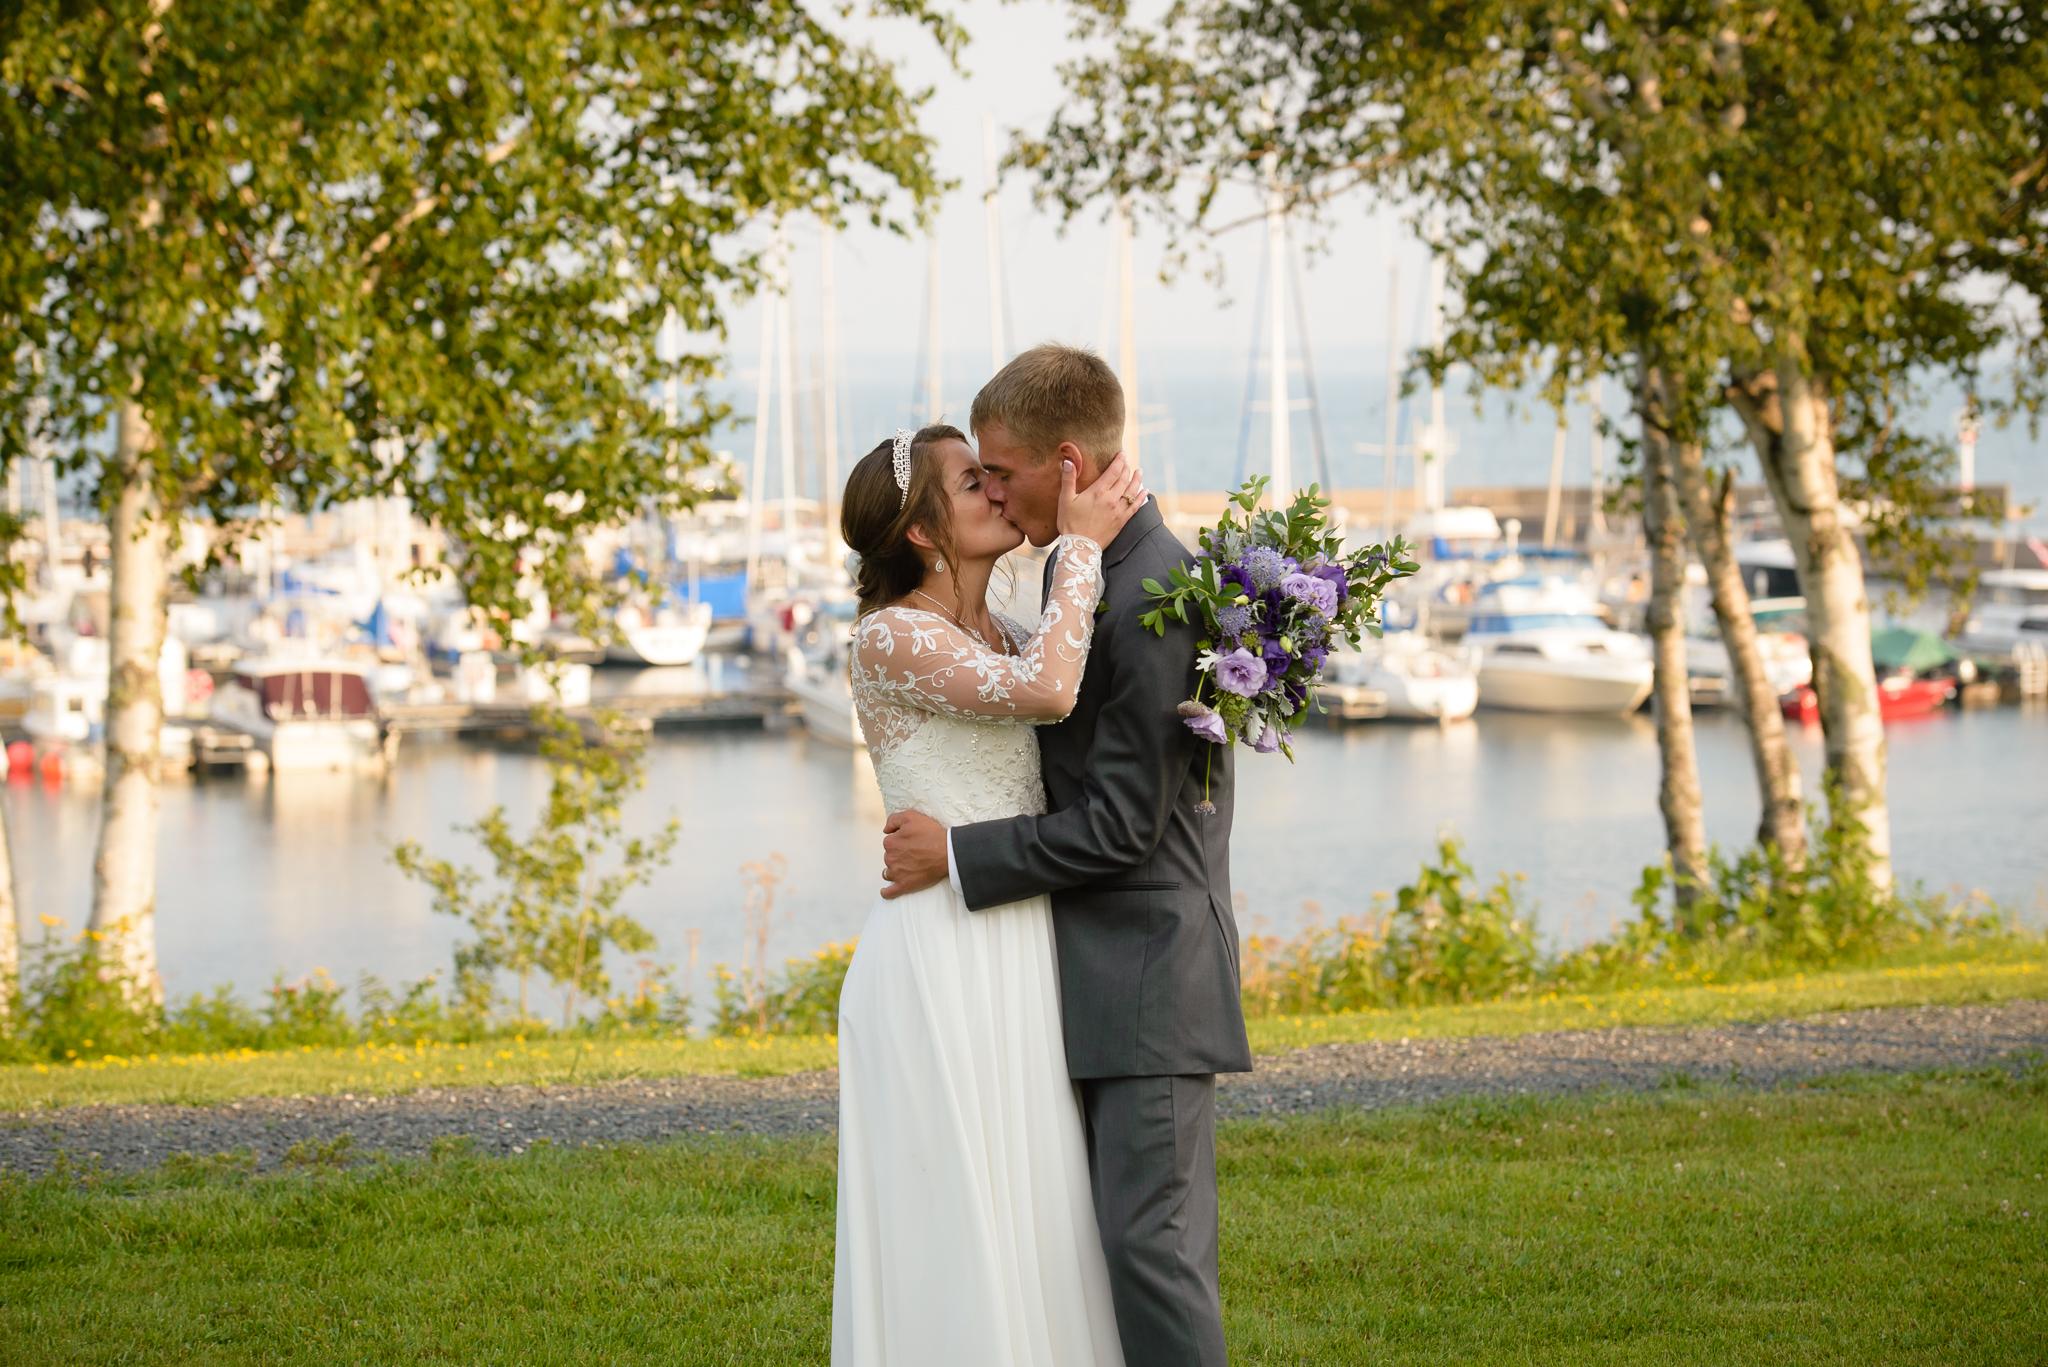 40-ashland washburn wedding photographyDSC_5593.jpg